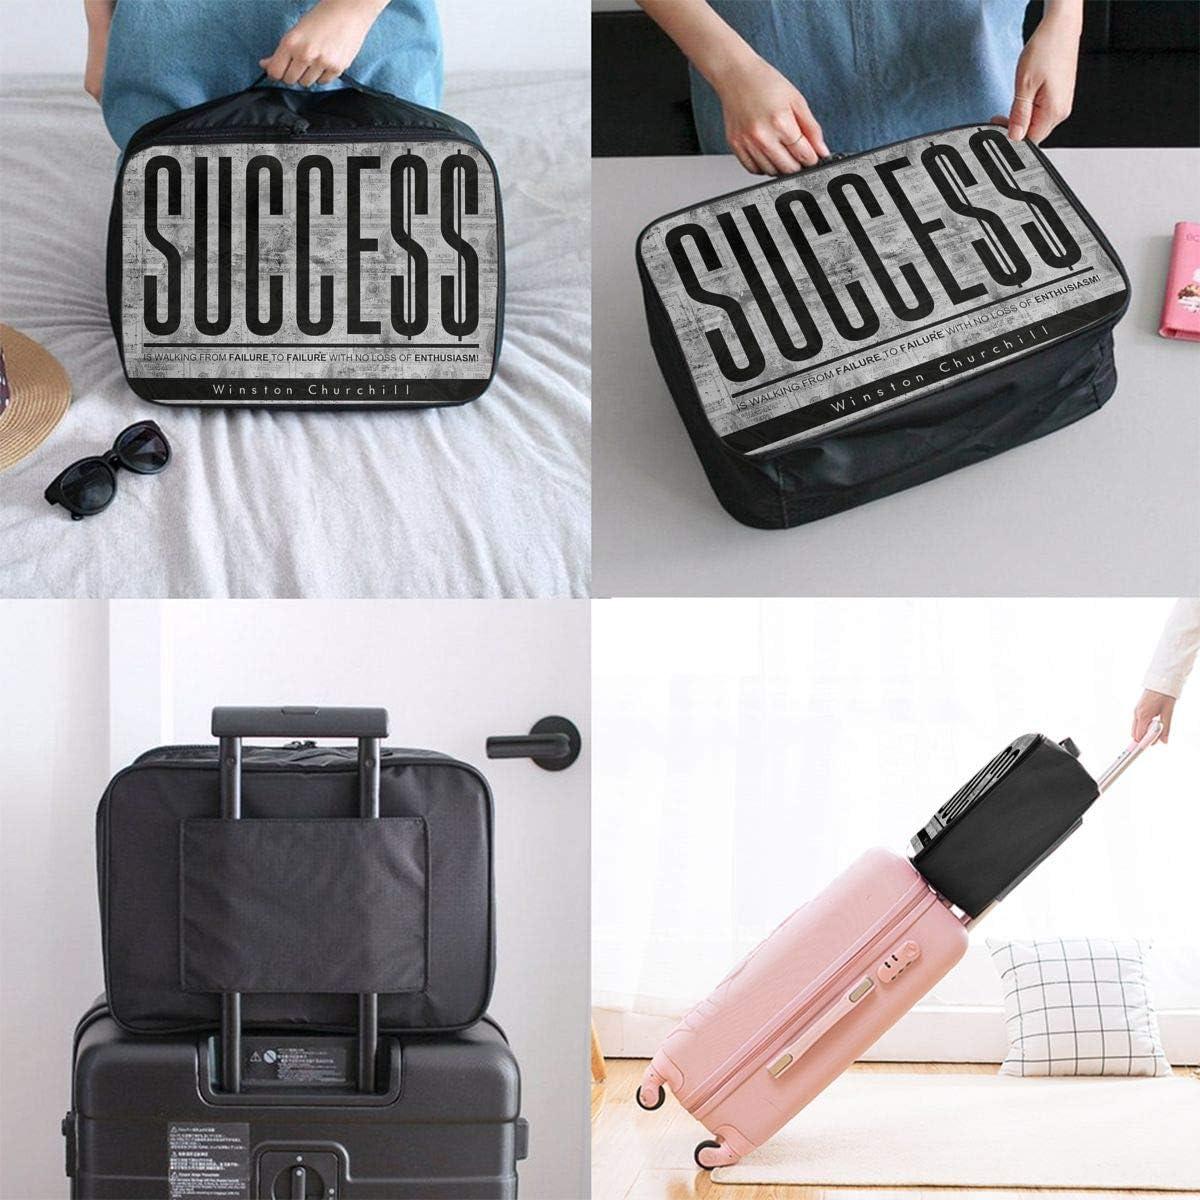 Culora Motivation Entrepreneur Successful Hustle Quote Inspiration Lightweight Large Capacity Portable Luggage Bag